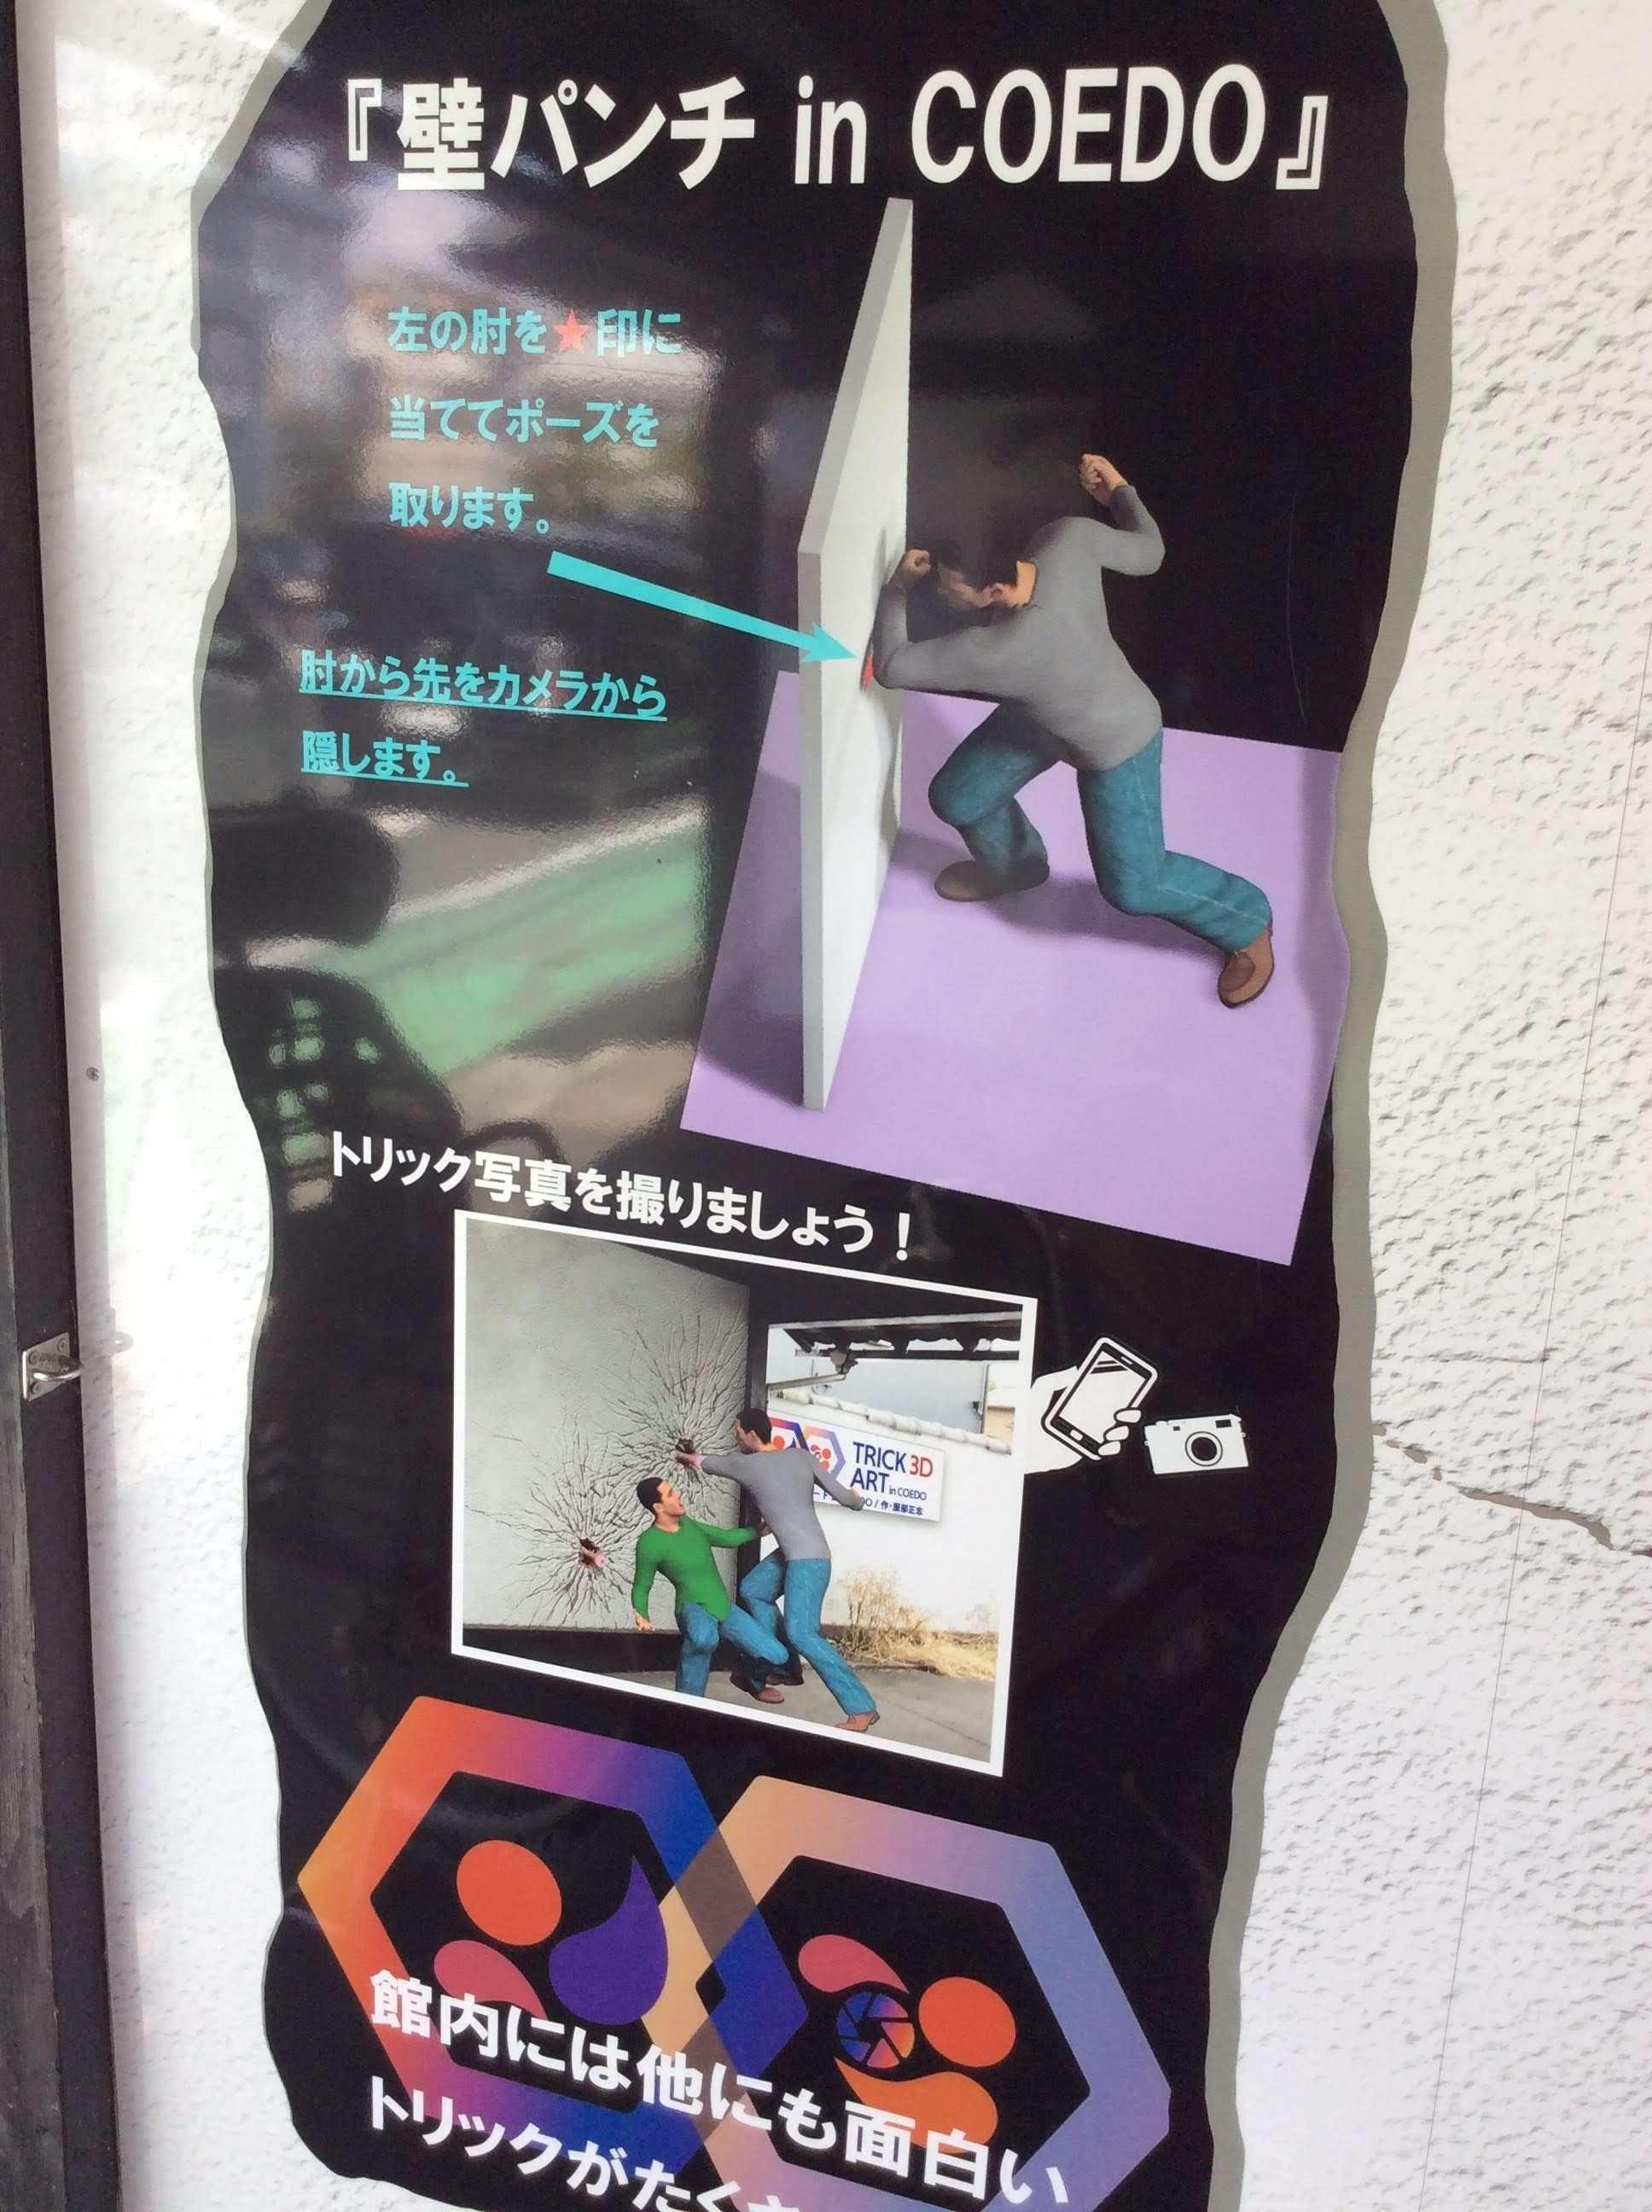 Kawagoe trick art museum in Coedo